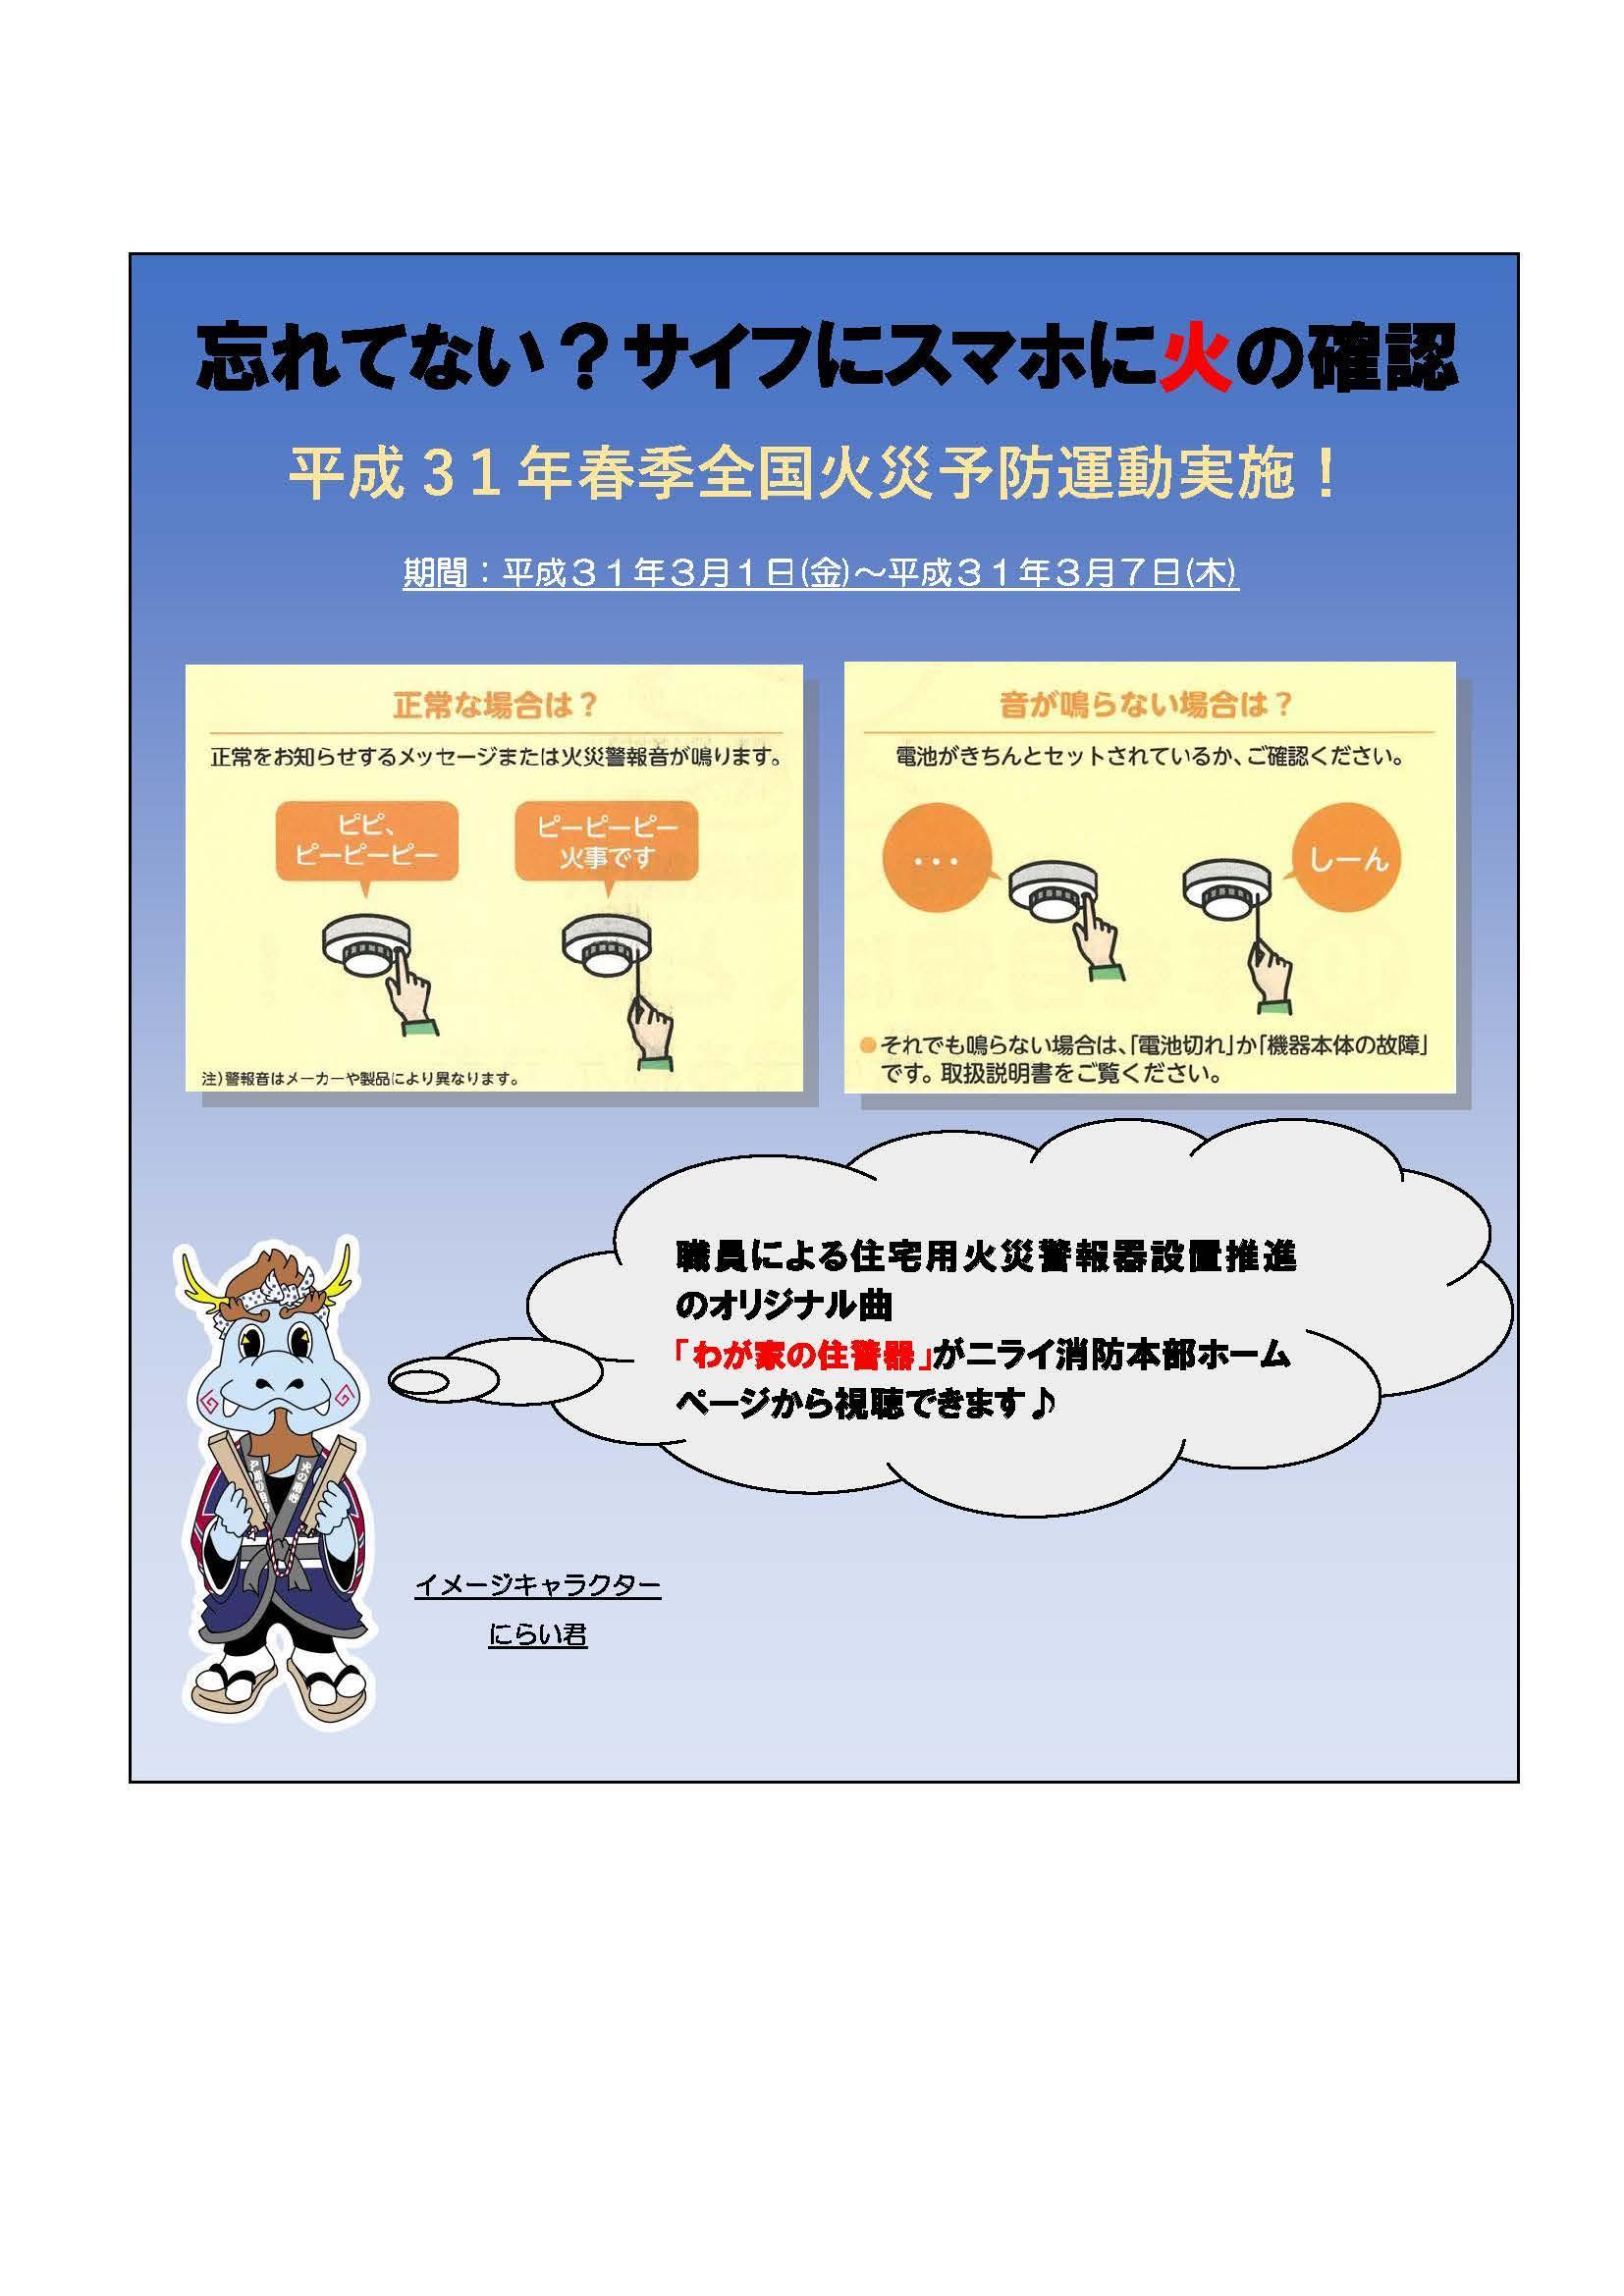 HP用_火災予防運動広報記事.jpg